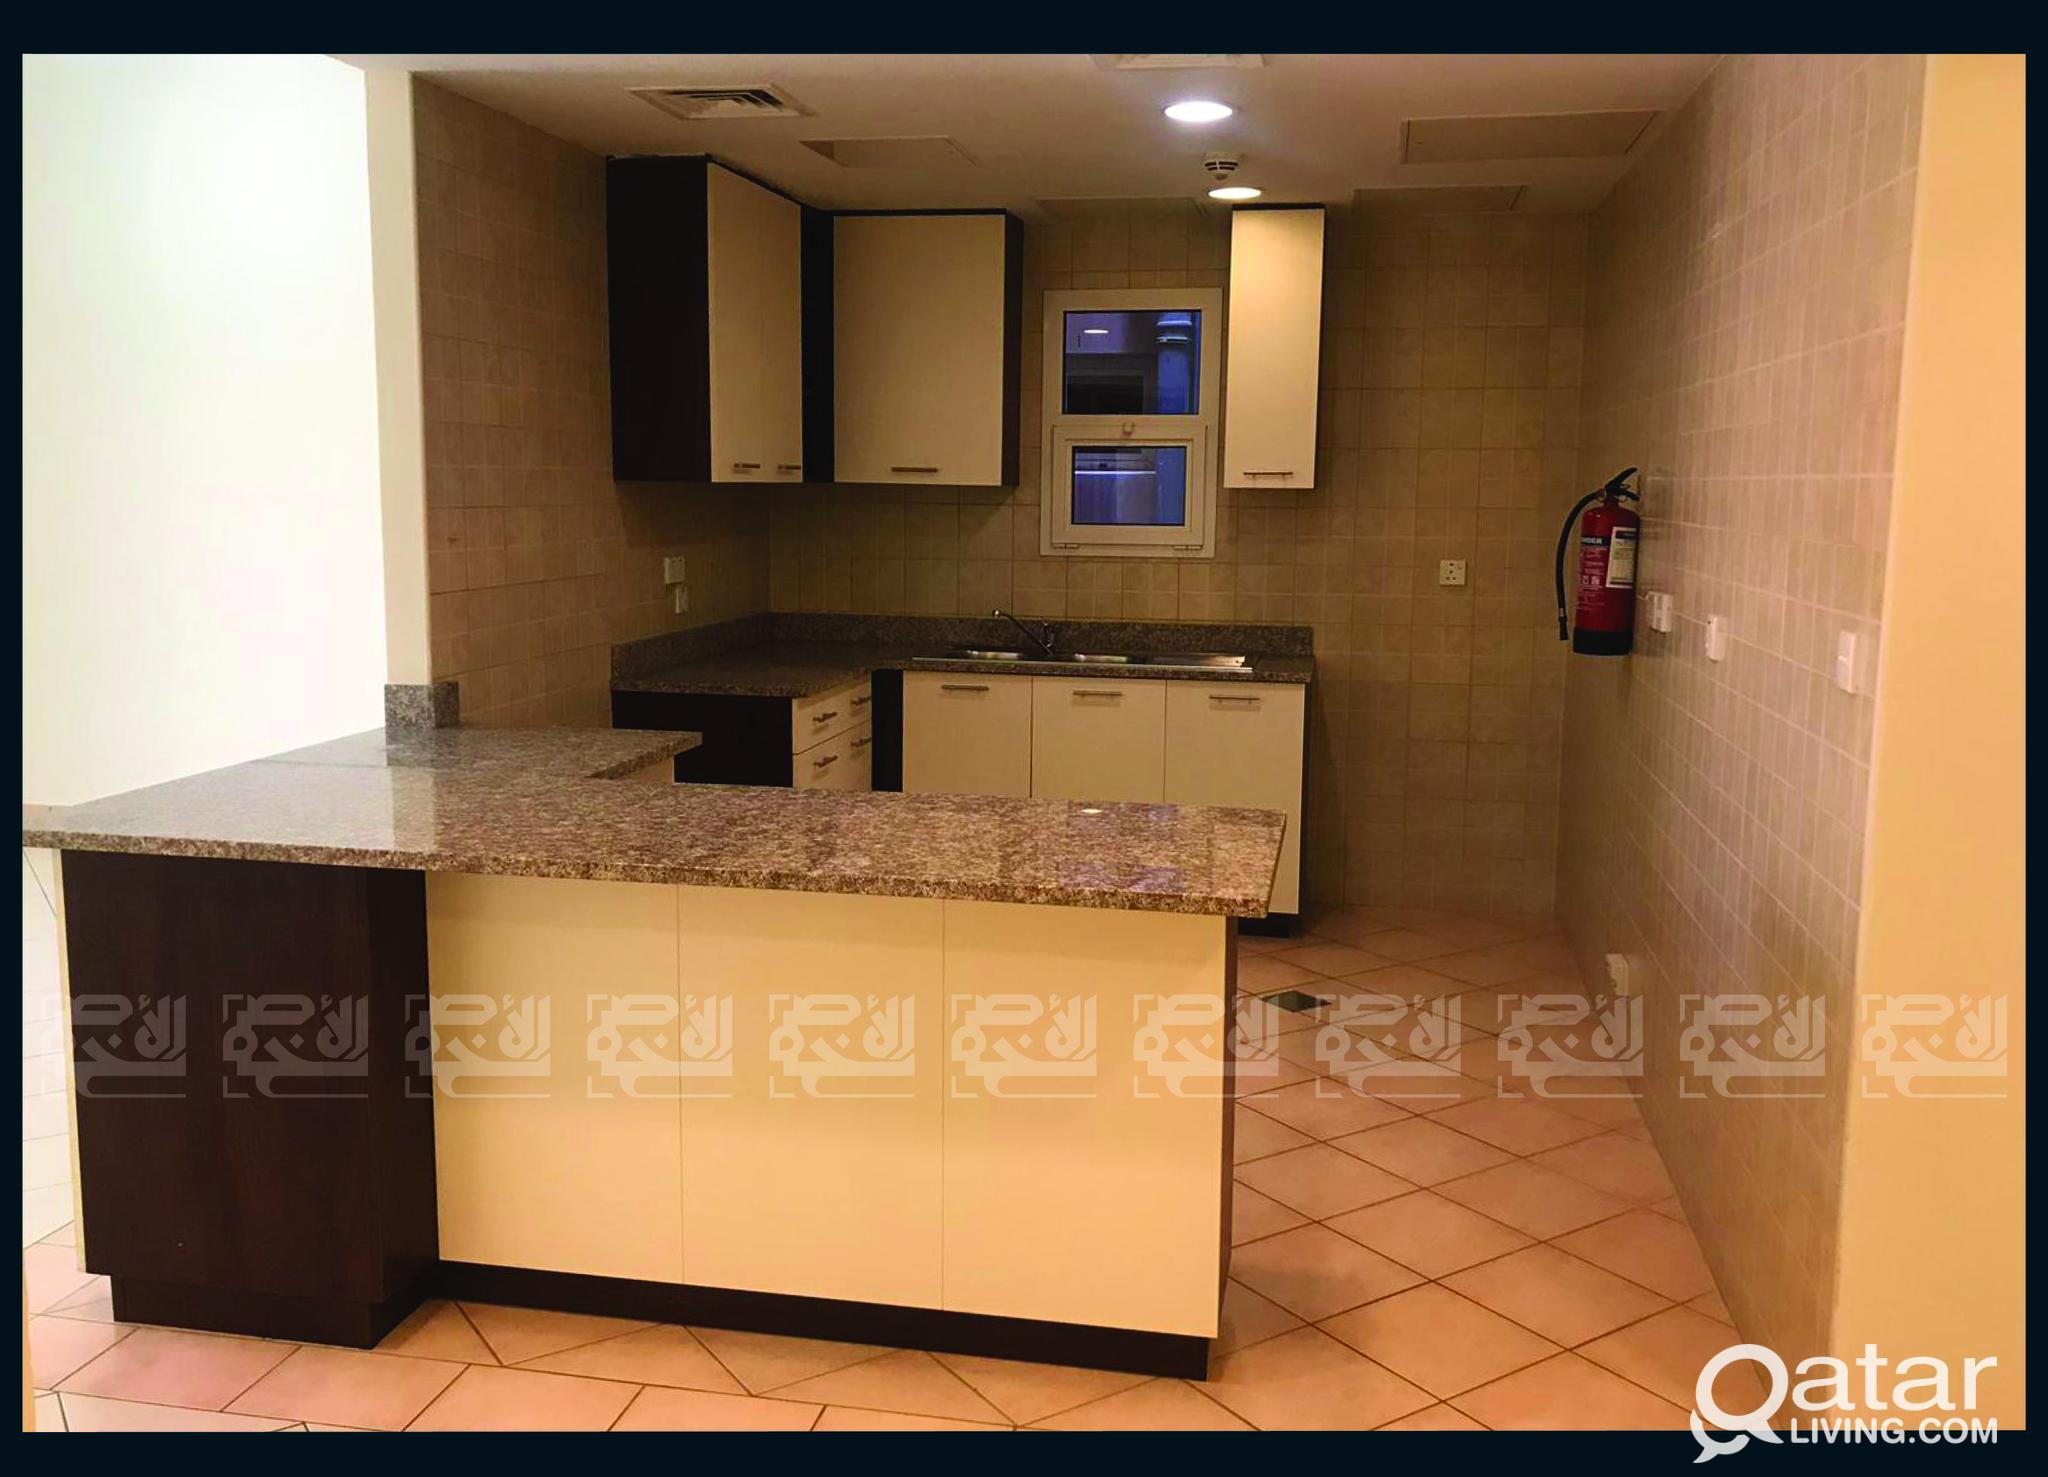 Unfurnished 2-Bedroom Apartment in Mesaimeer City